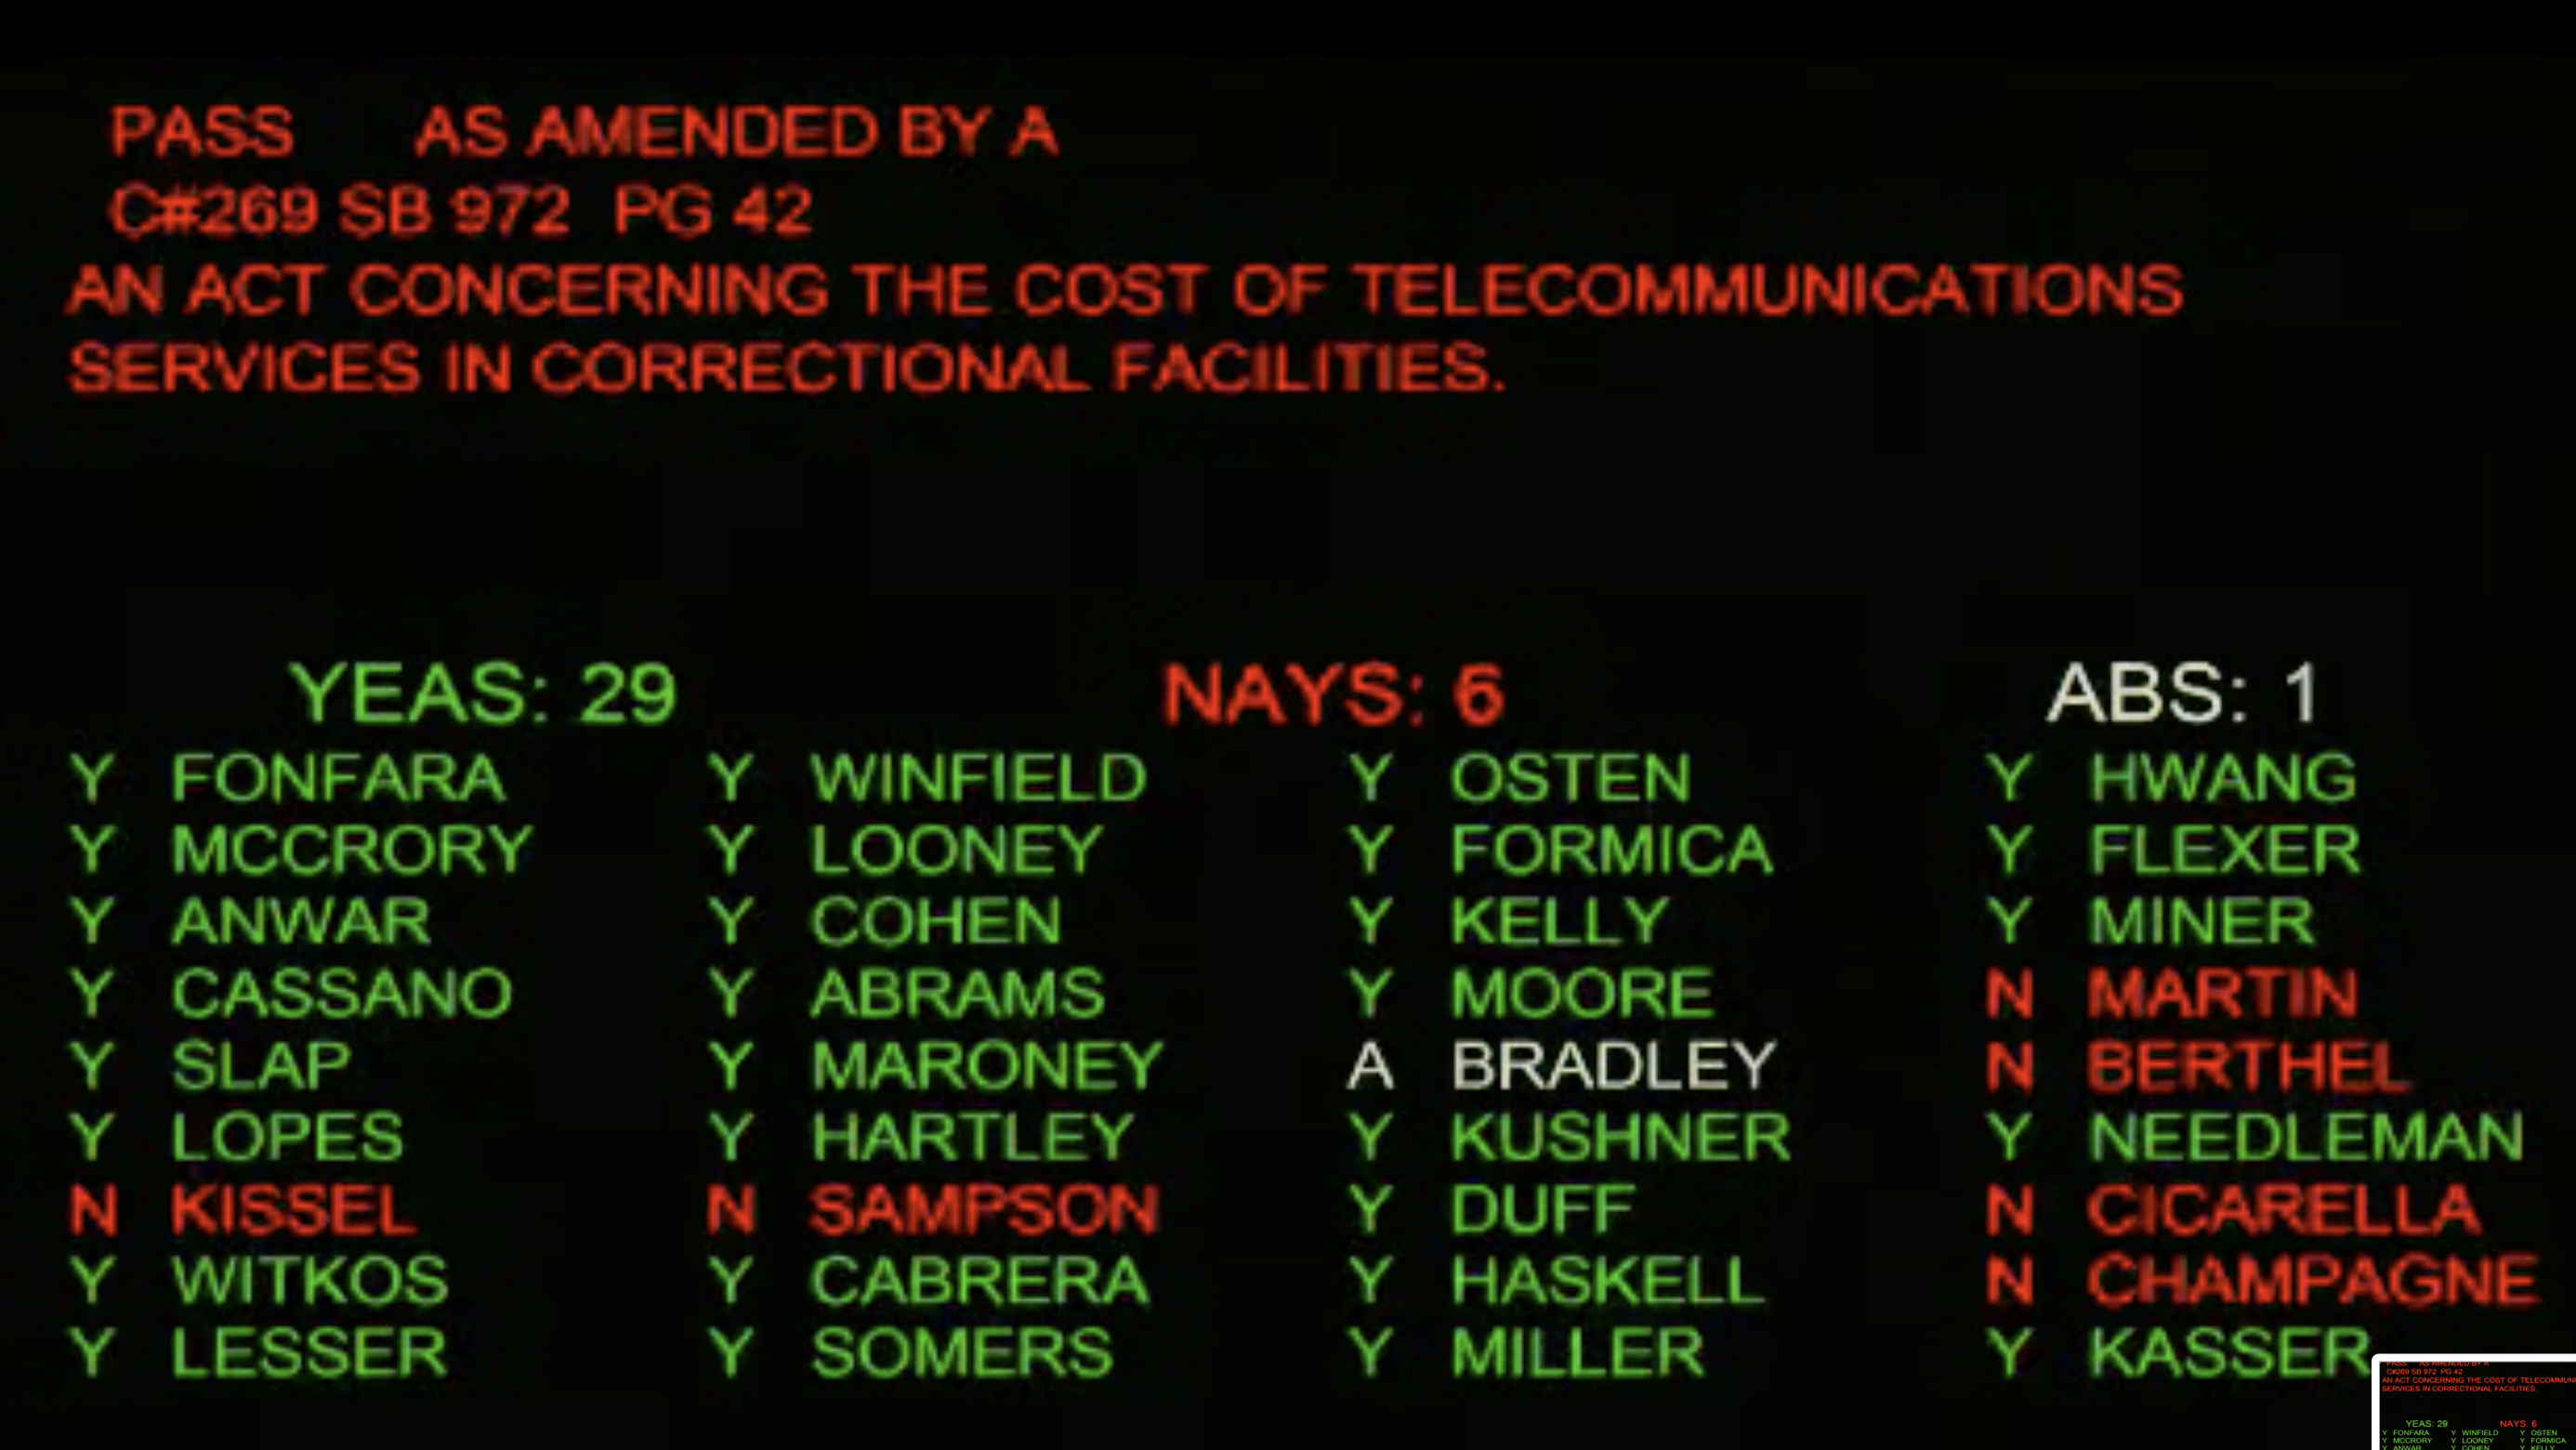 Senate OKs free phone calls from prisons